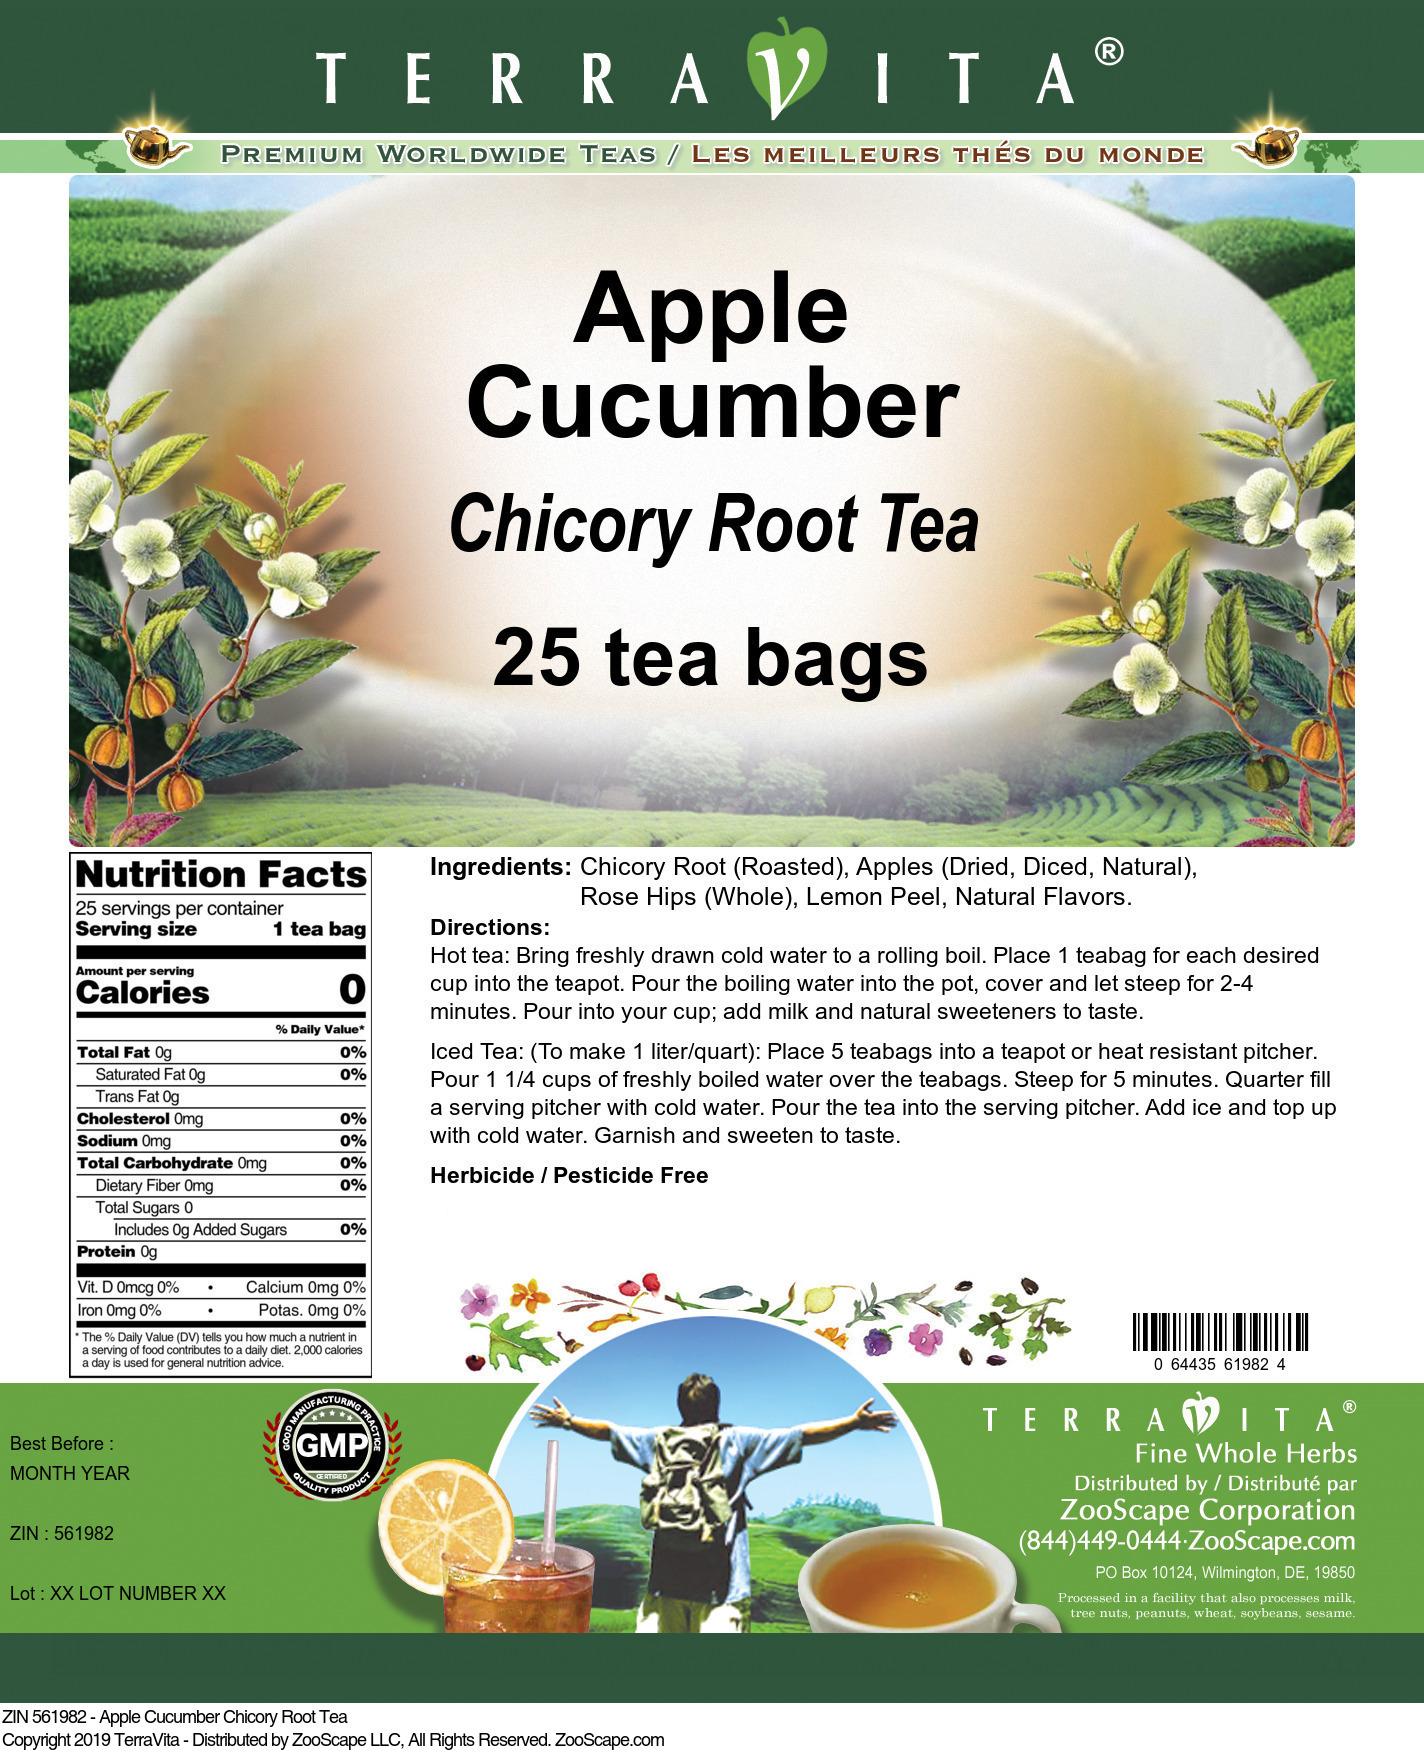 Apple Cucumber Chicory Root Tea